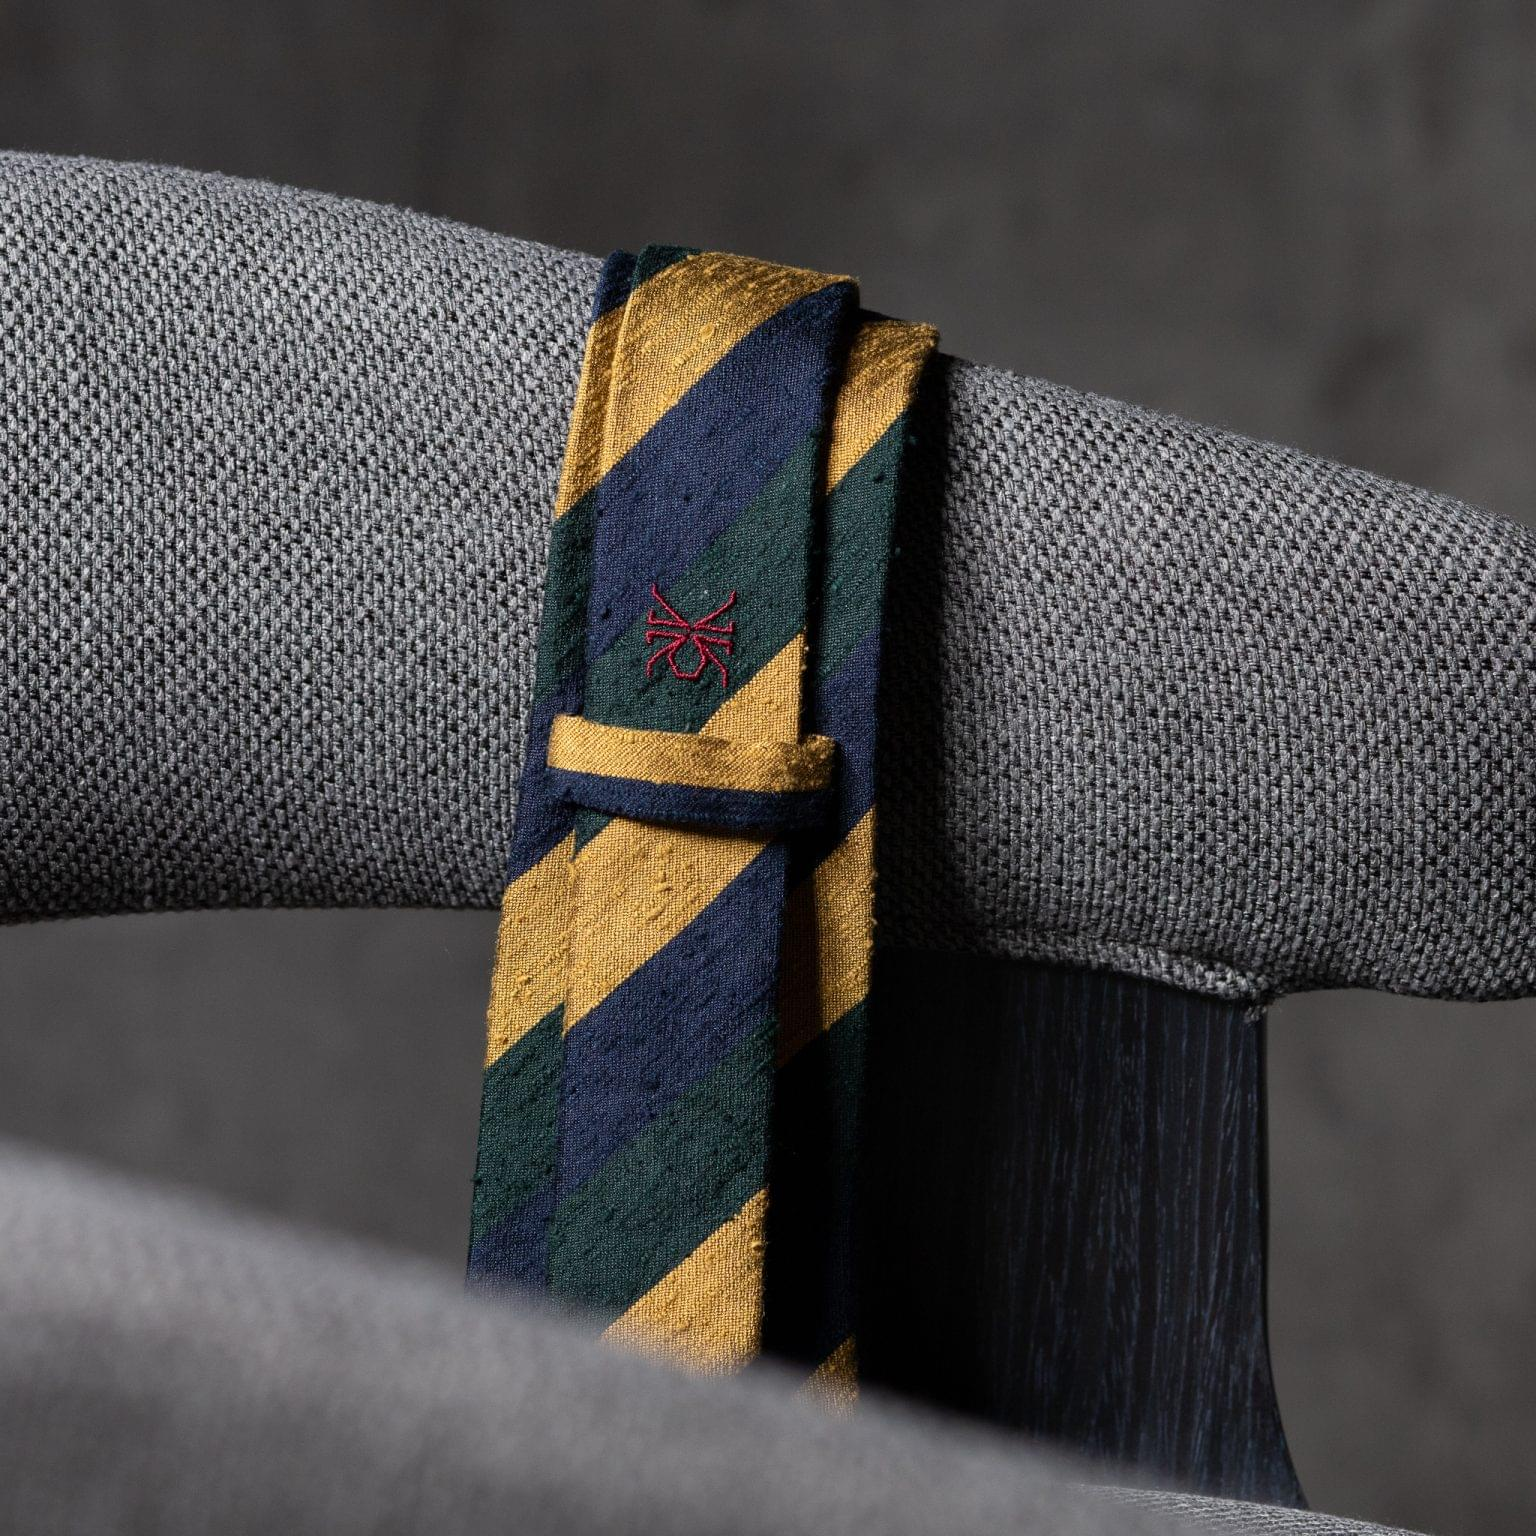 SHANTUNG-0355-Tie-Initials-Corbata-Iniciales-The-Seelk-4